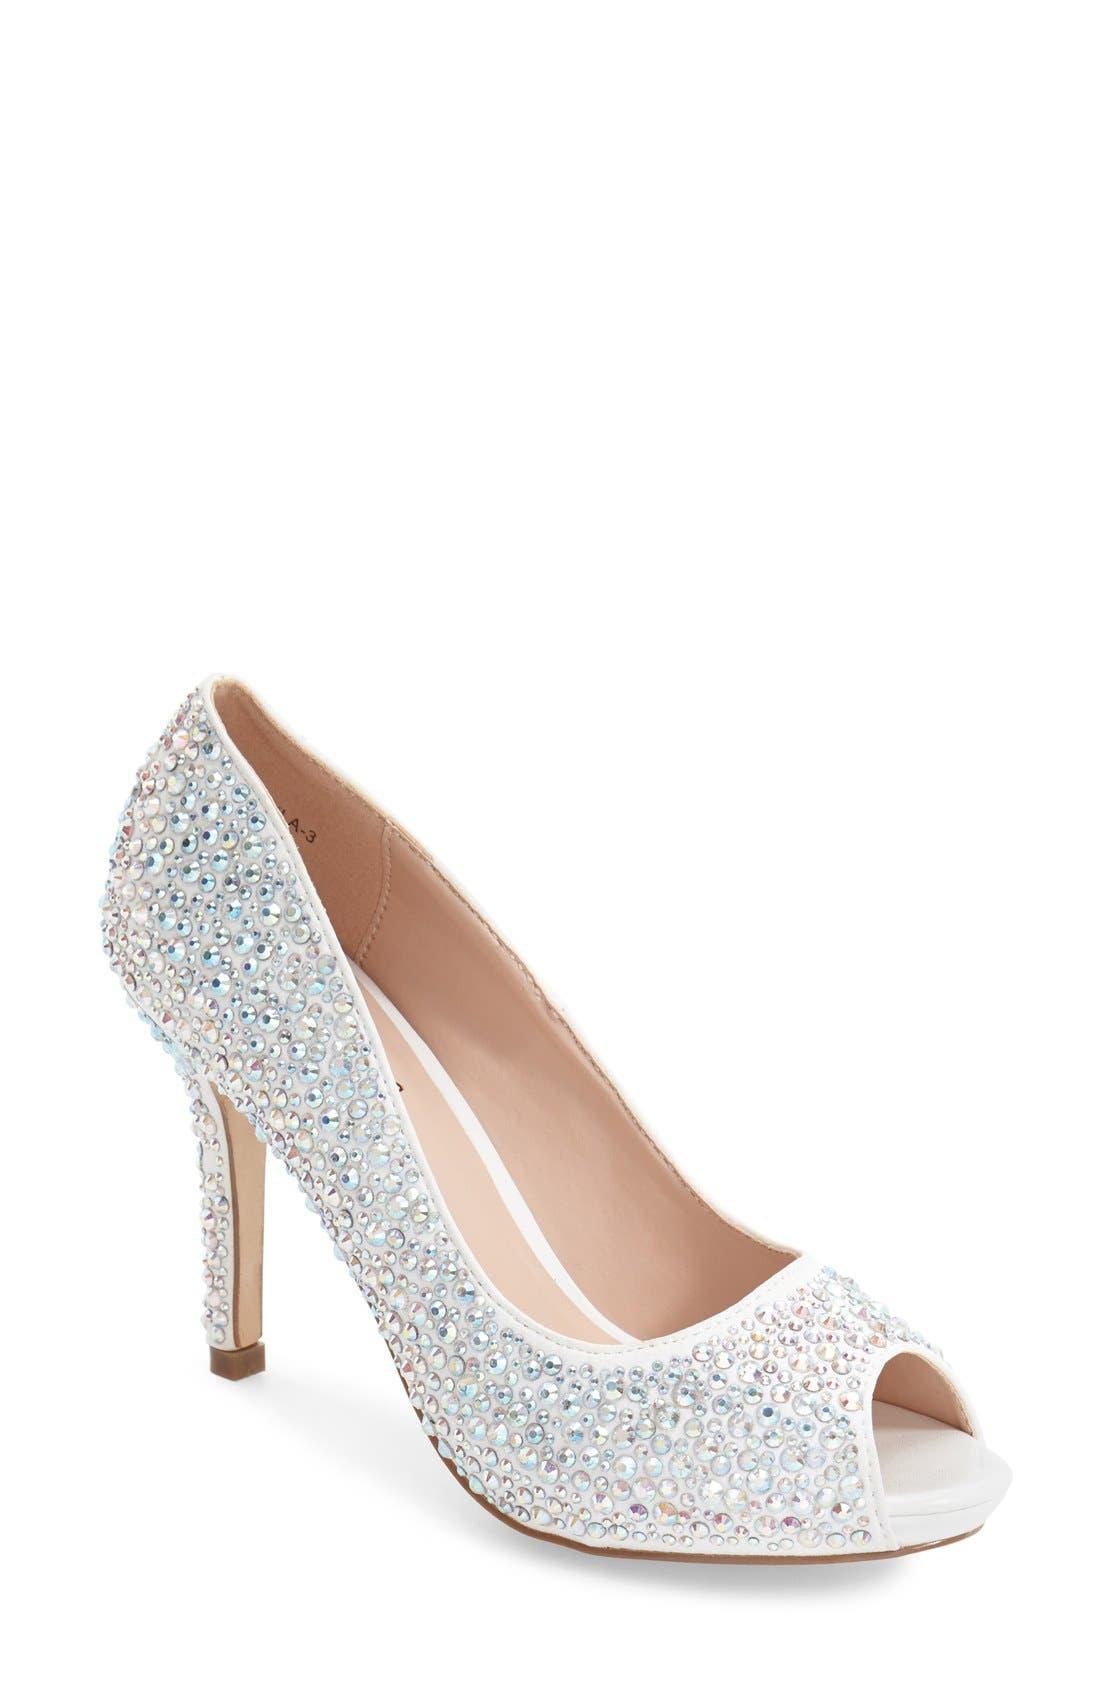 Women's White Heels: Sale | Nordstrom